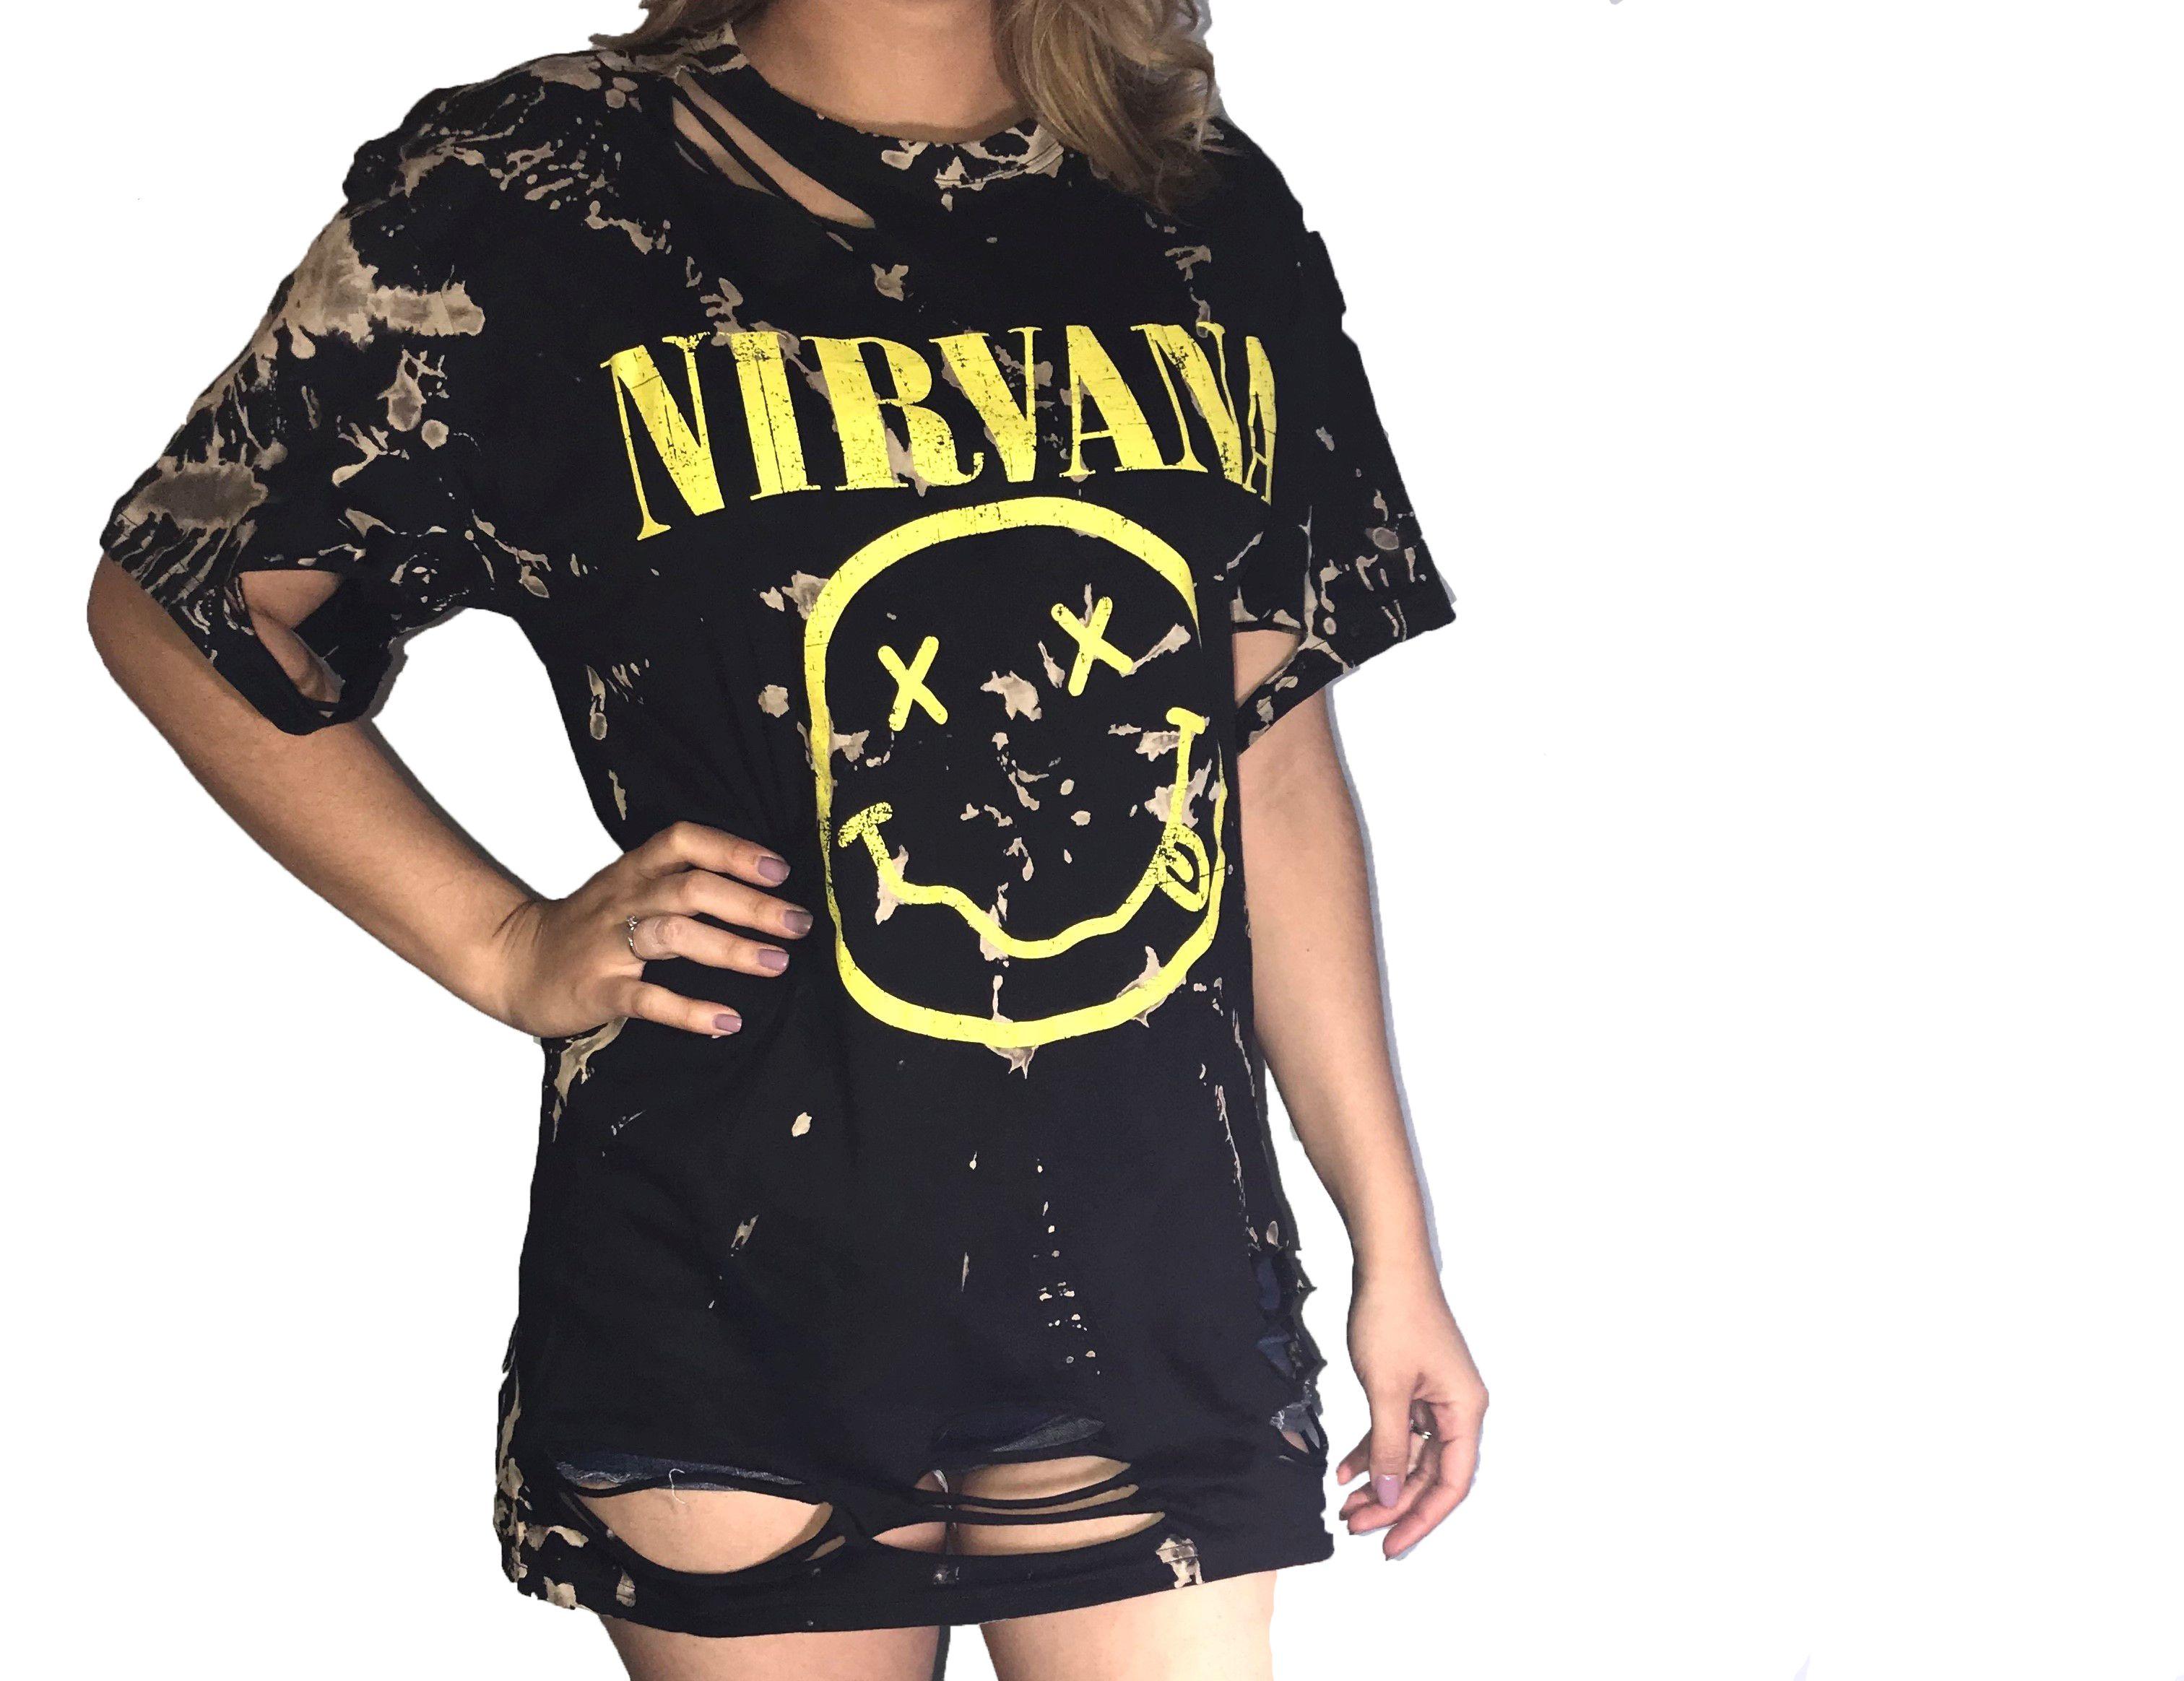 Tie Dye Nirvana Shirt Band Shirt Outfits Nirvana Shirt Outfit